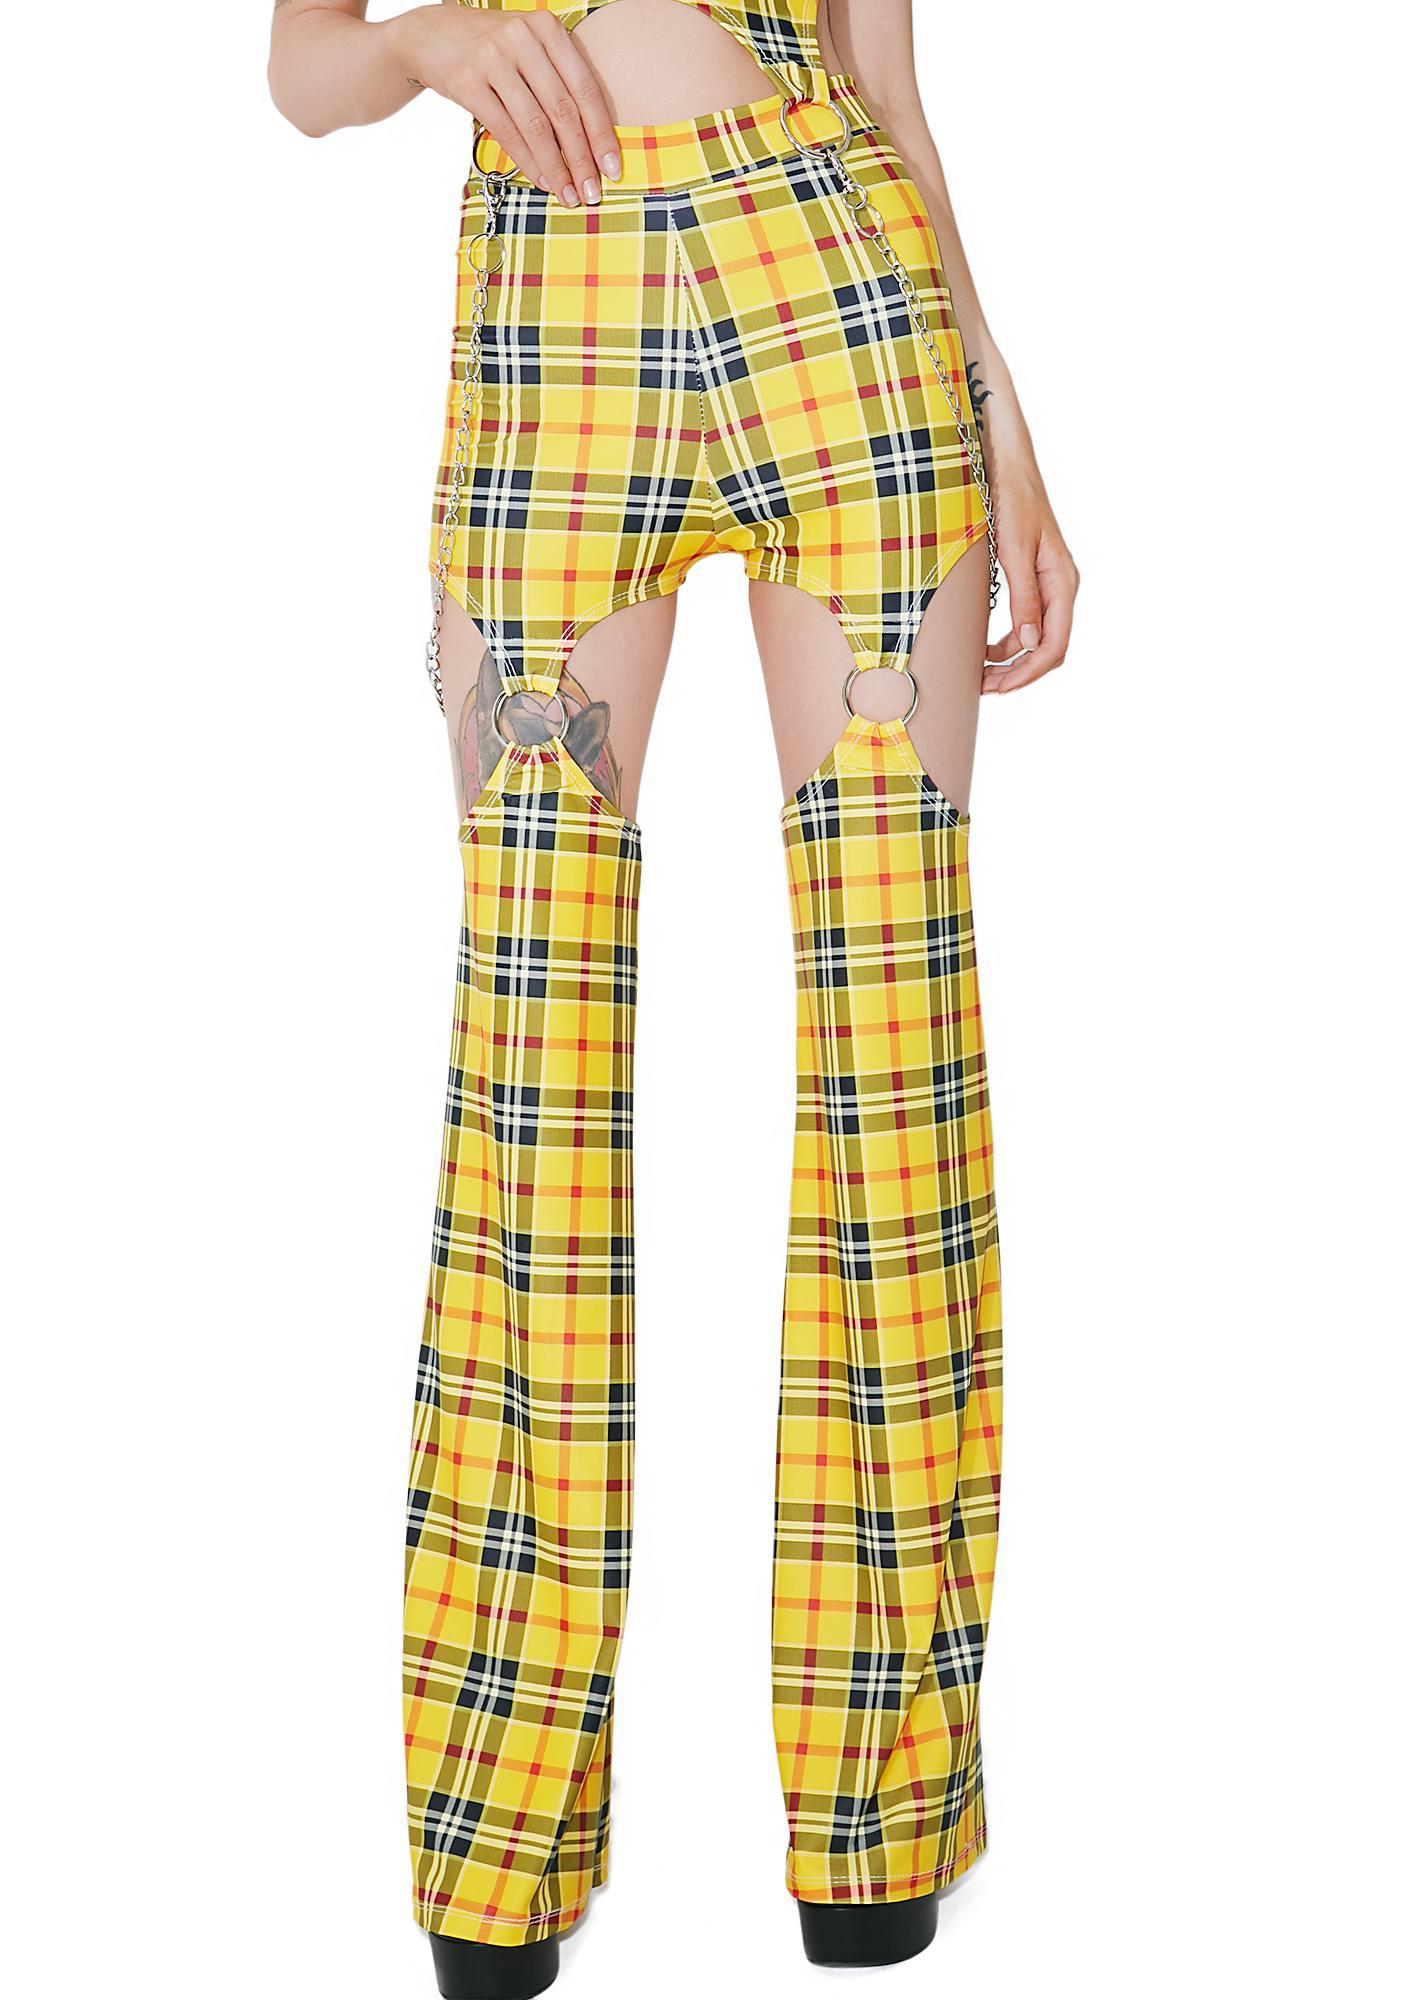 DEVOWEVO School Gurl Riot Garter Pants